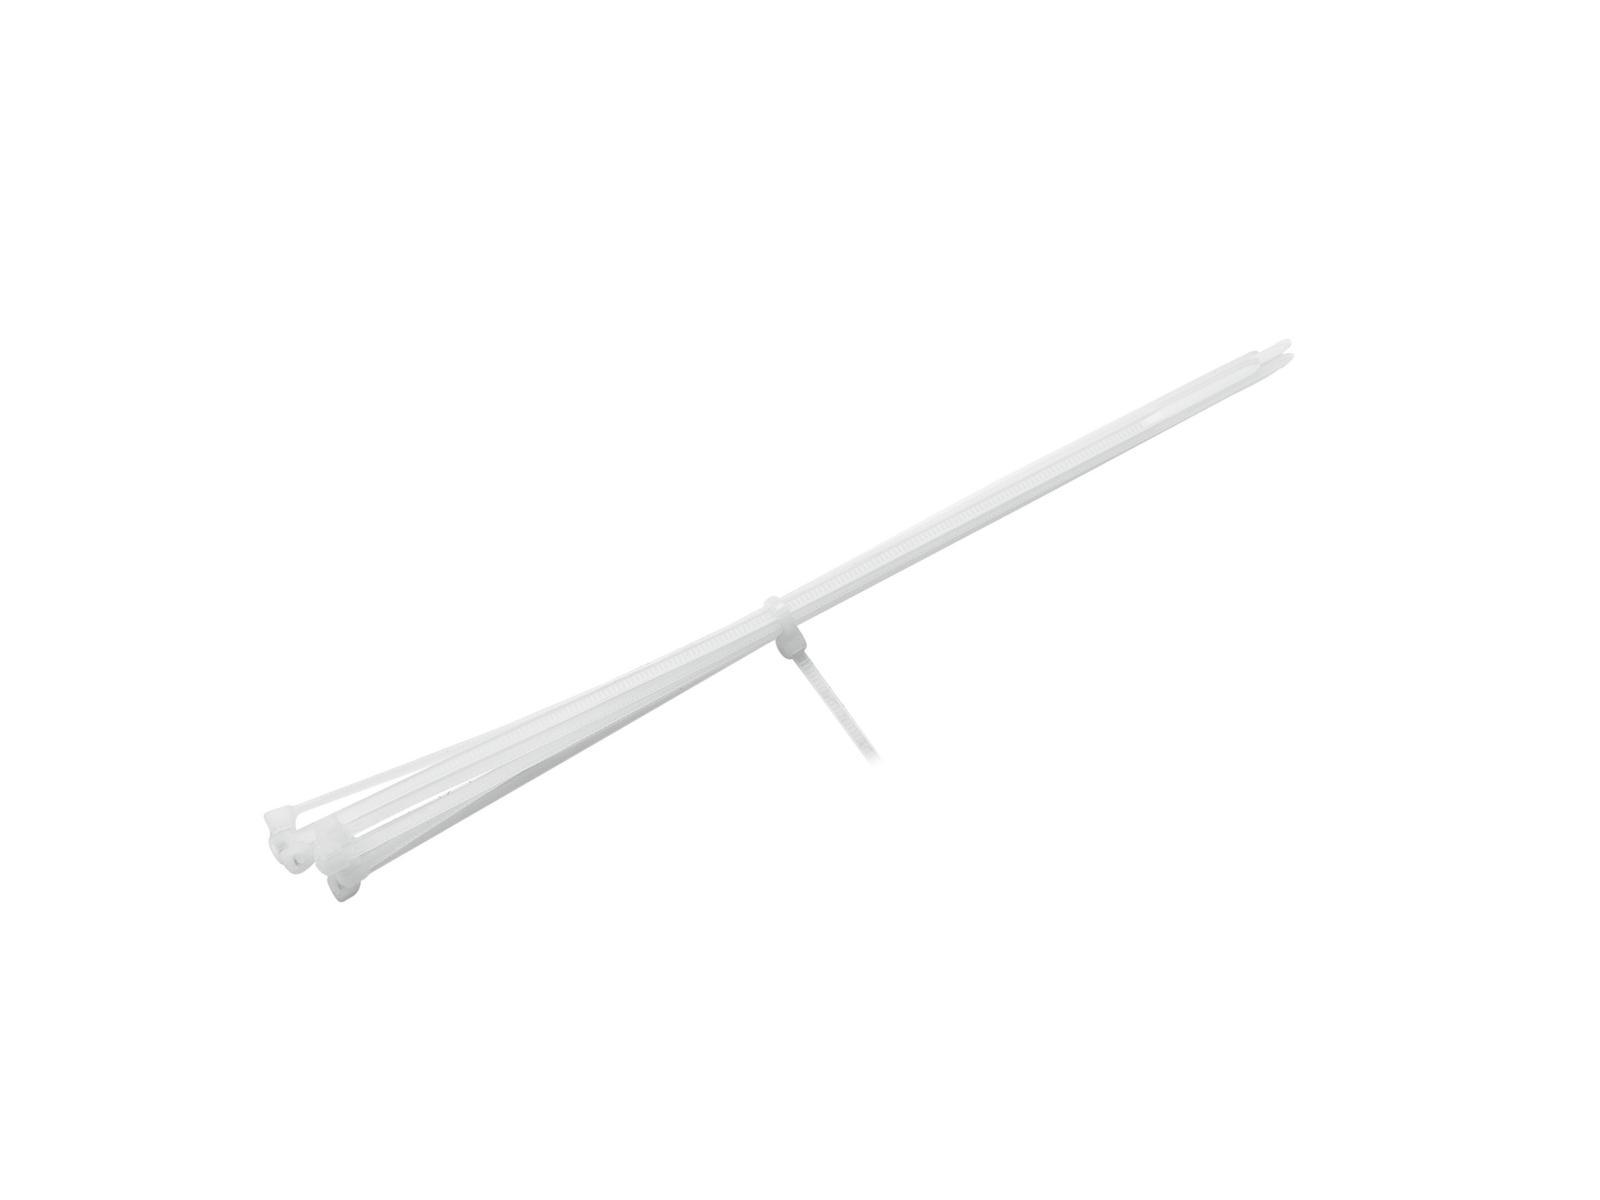 EUROLITE Cavo cravatta 450x4.8mm bianco 100x